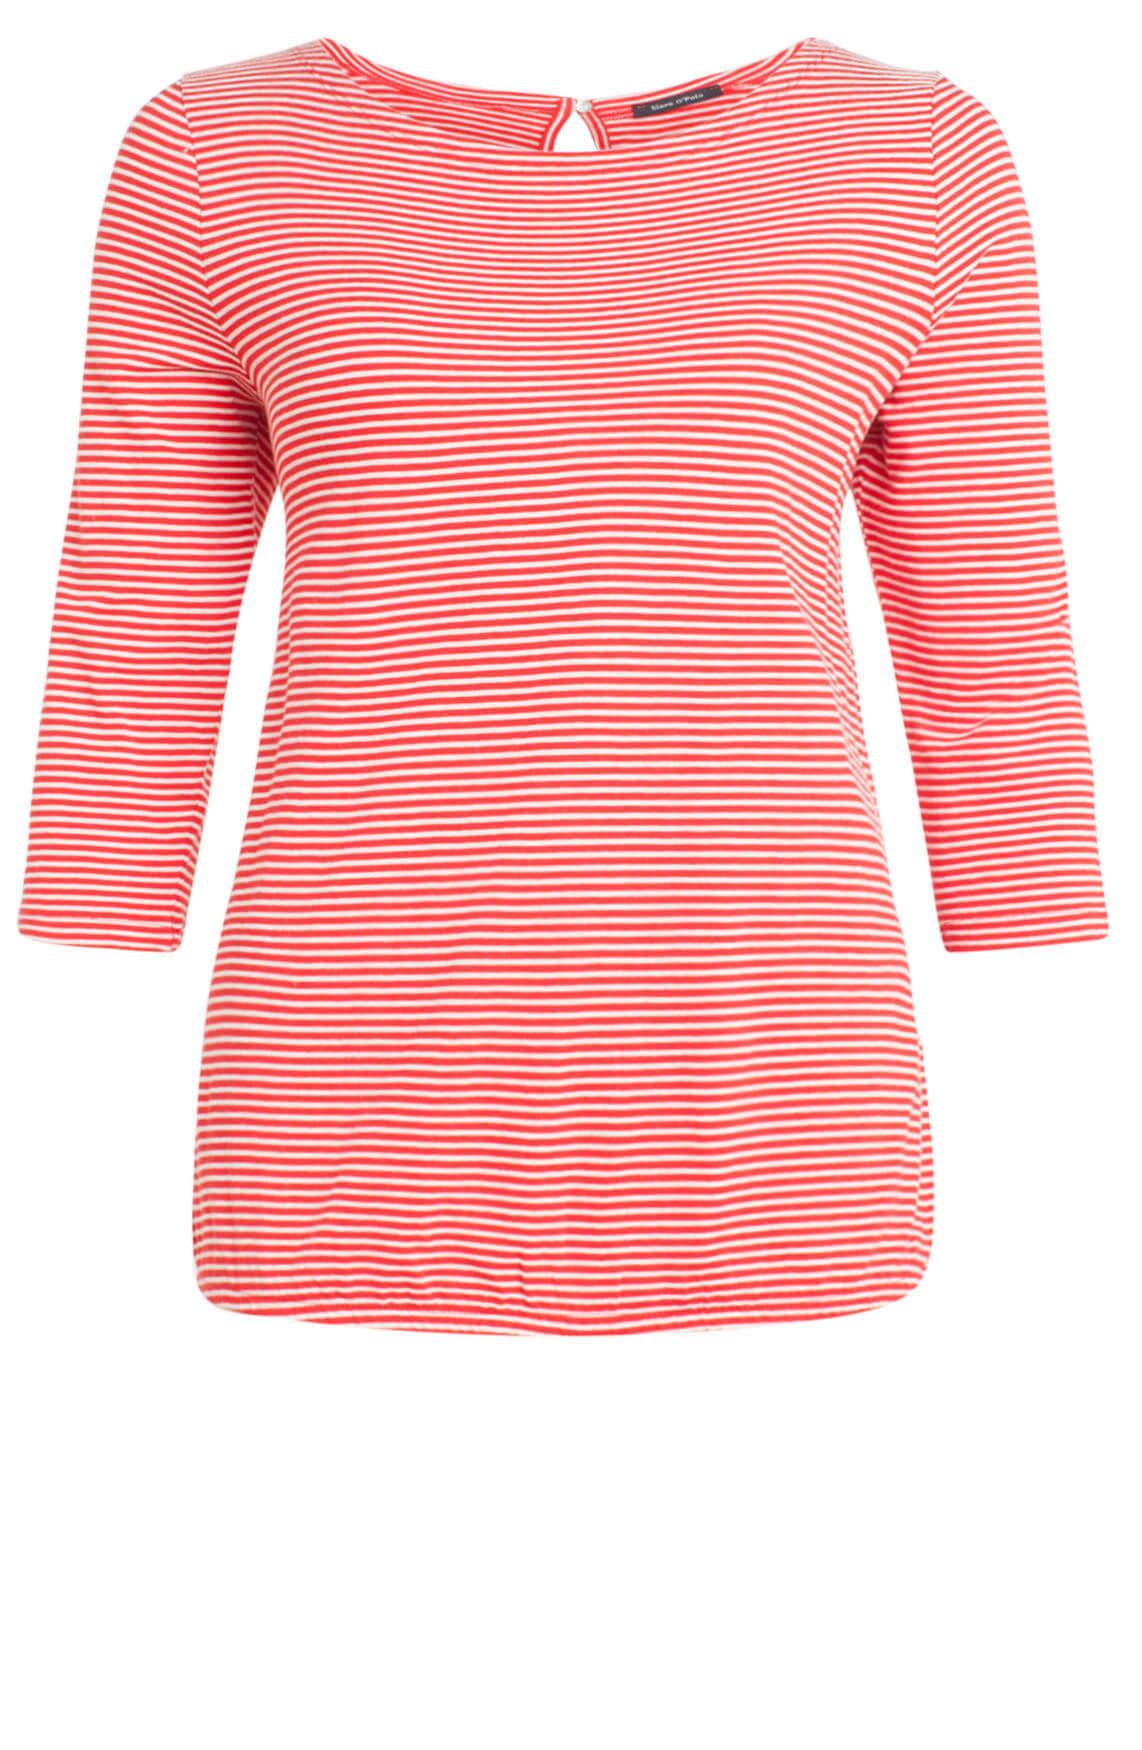 Marc O'Polo Dames Gestreept shirt rood Rood